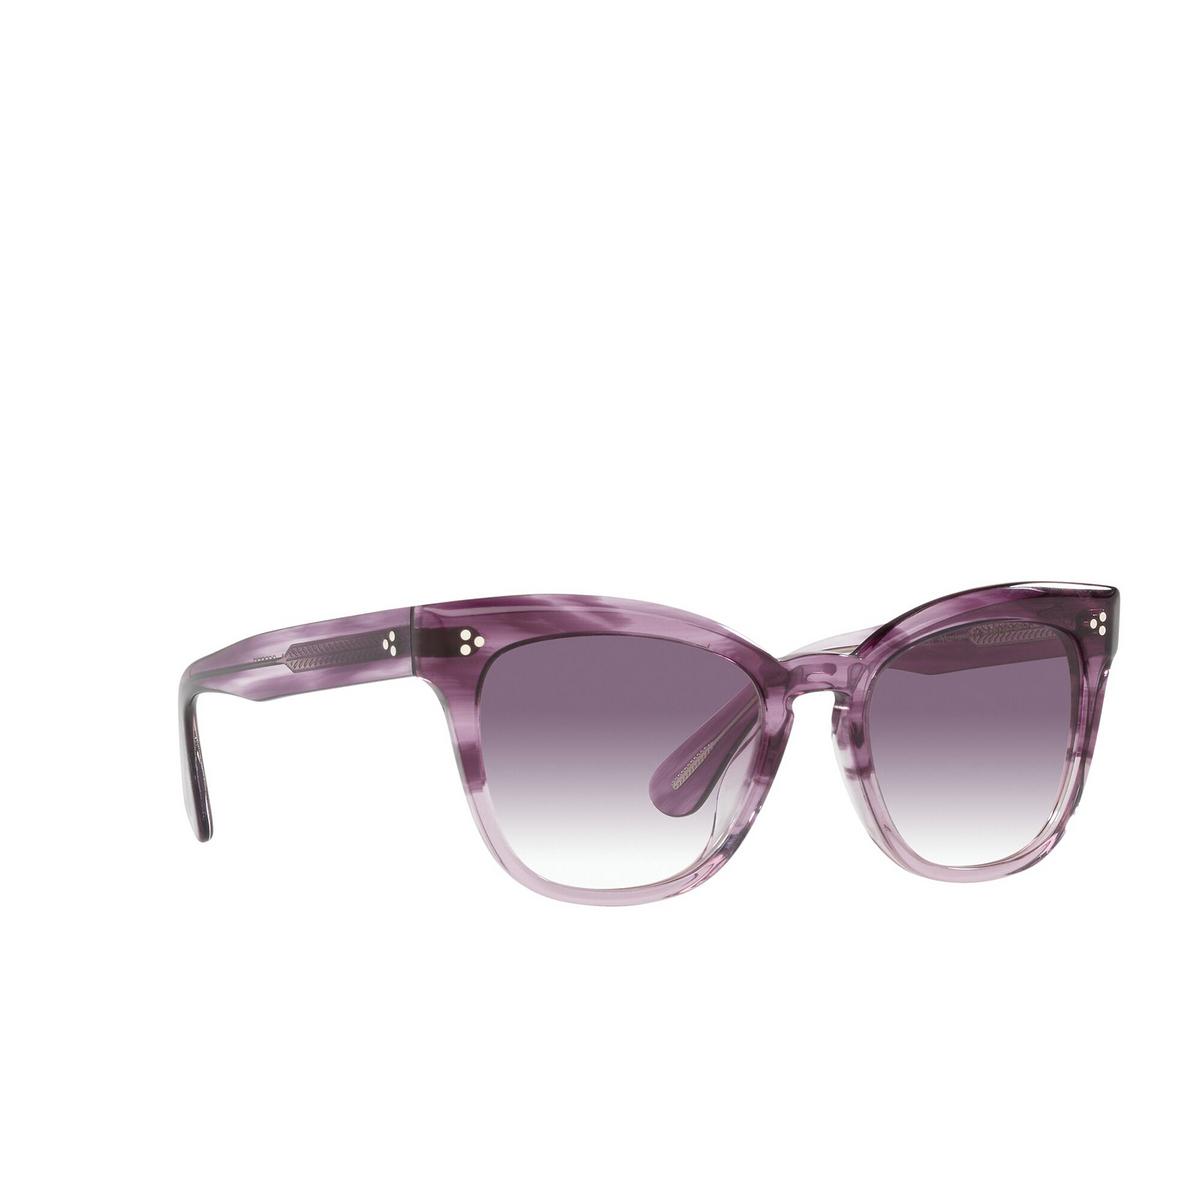 Oliver Peoples® Butterfly Sunglasses: Marianela OV5372SU color Jacaranda Gradient 16918H - three-quarters view.